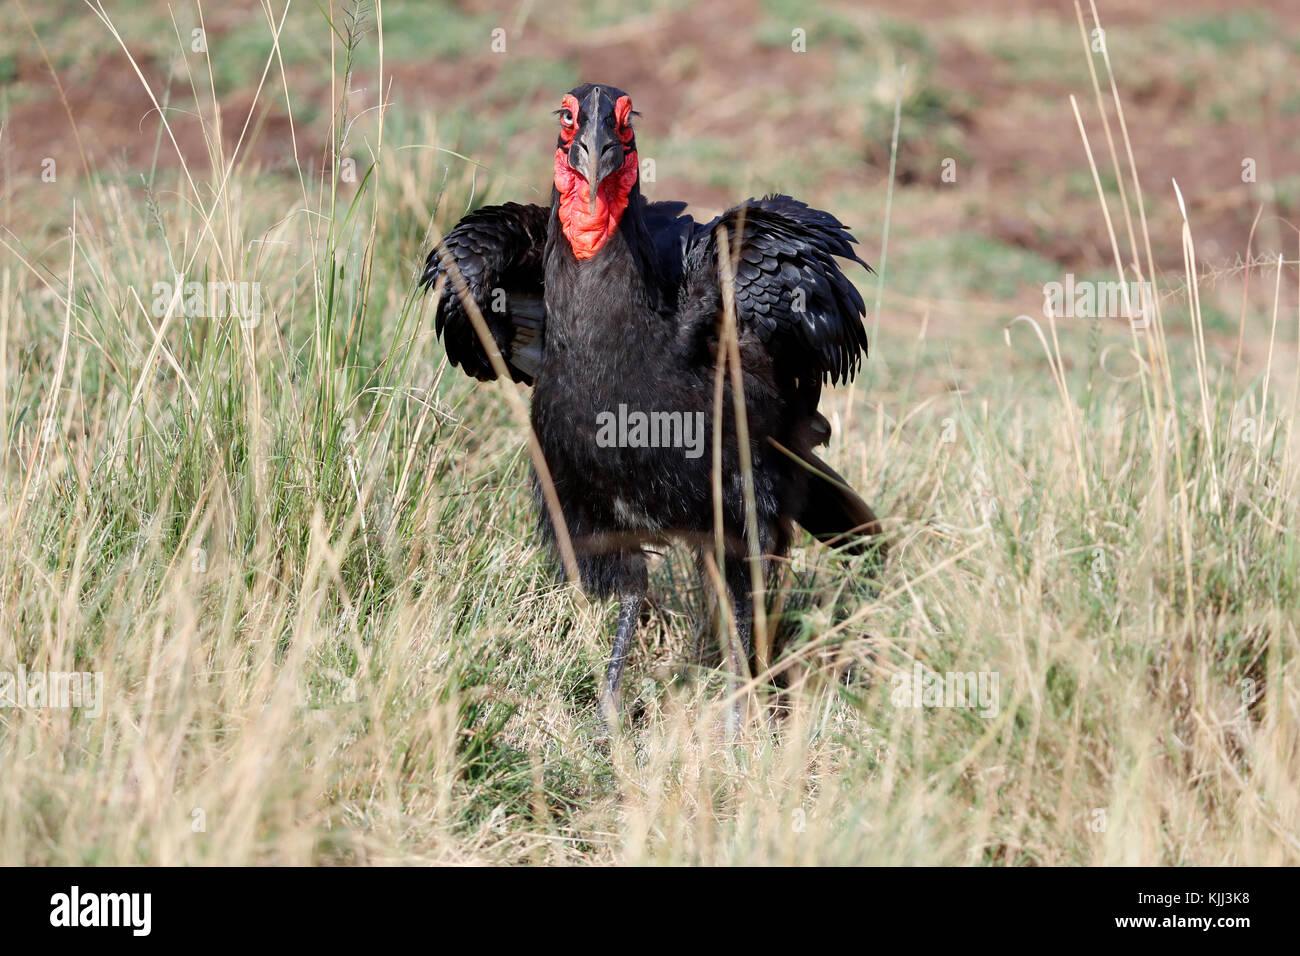 Südliche Hornrabe (Bucorvus leadbeateri). Masai Mara Game Reserve. Kenia. Stockfoto